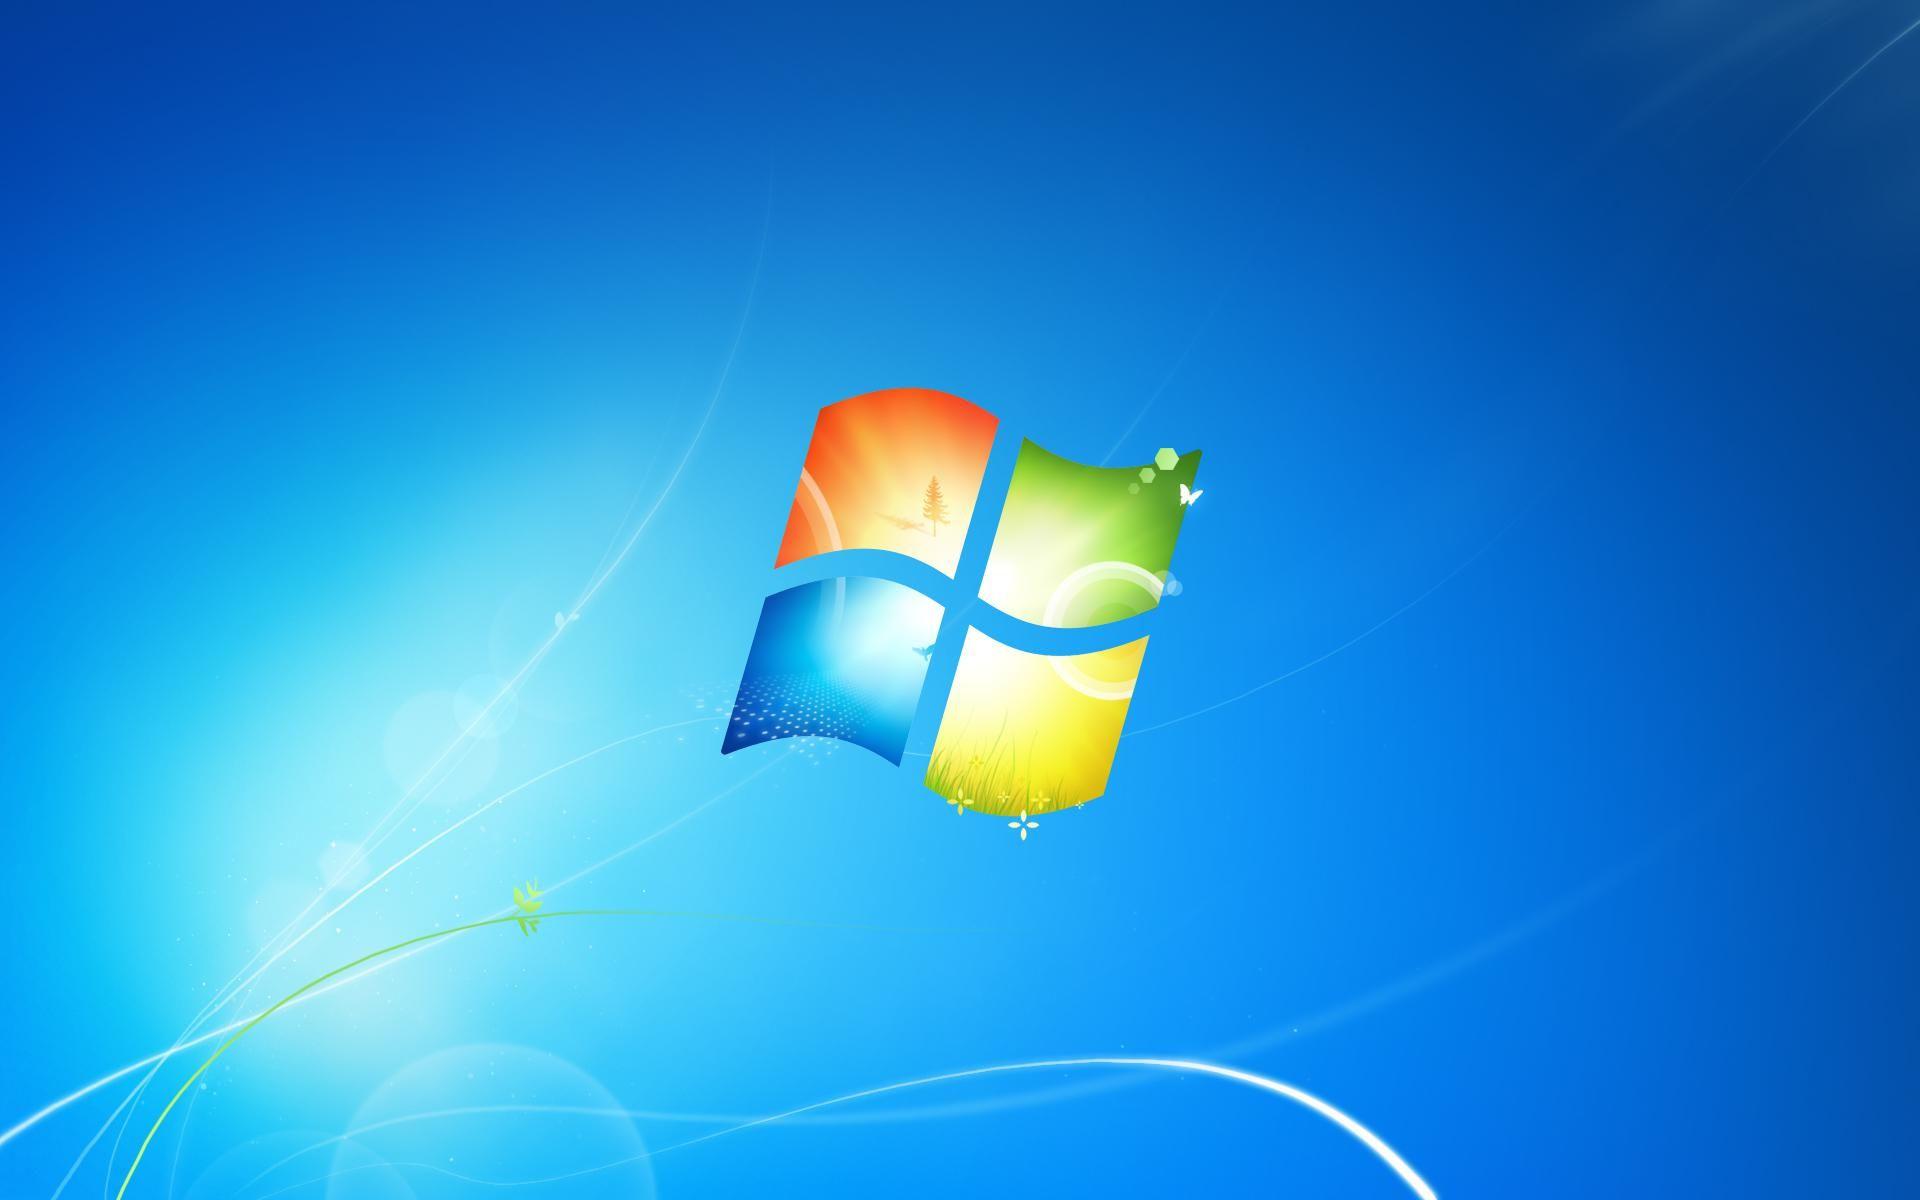 Windows 7 Default Wallpaper 1920x1200 Full Credits To U Pbartley47701g Microsoft Wallpaper Computer Wallpaper Desktop Wallpapers Desktop Background Images